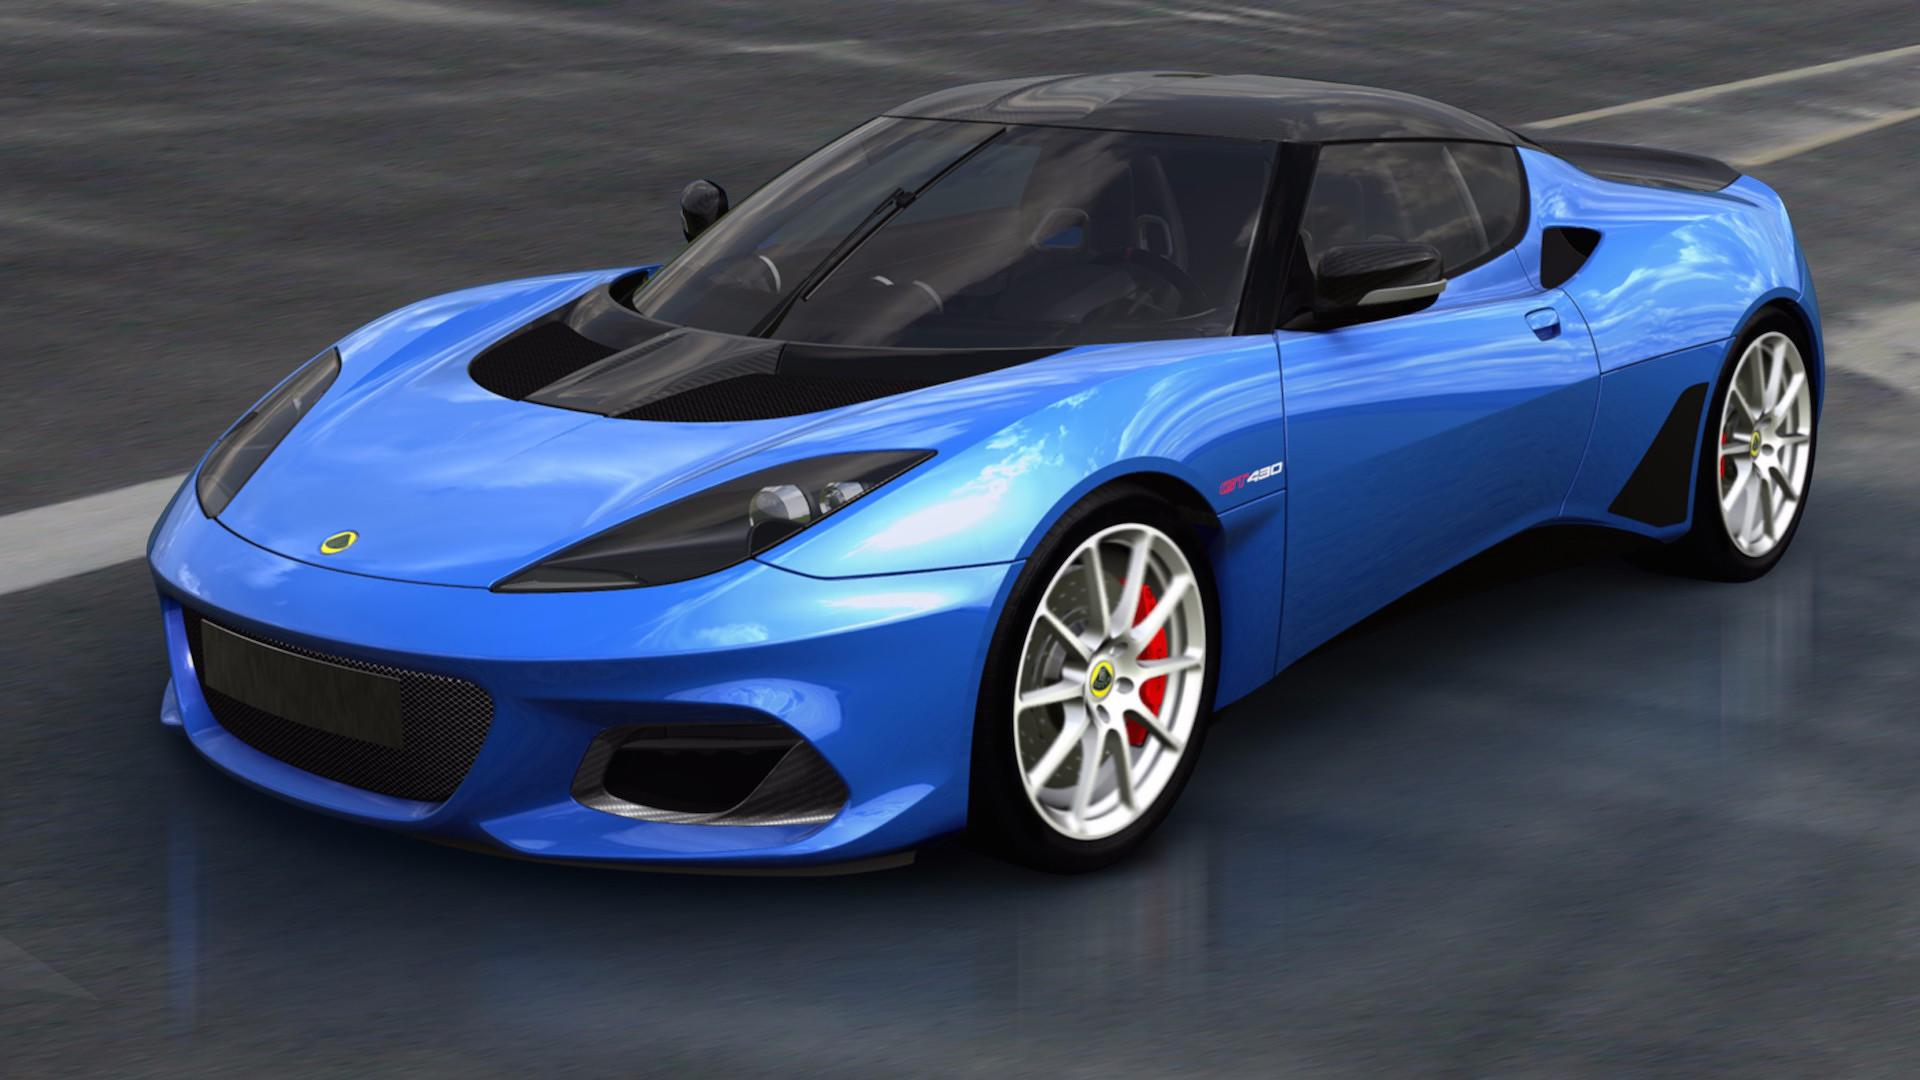 https://icdn-3.motor1.com/images/mgl/QVP88/s1/2018-lotus-evora-gt430-sport.jpg